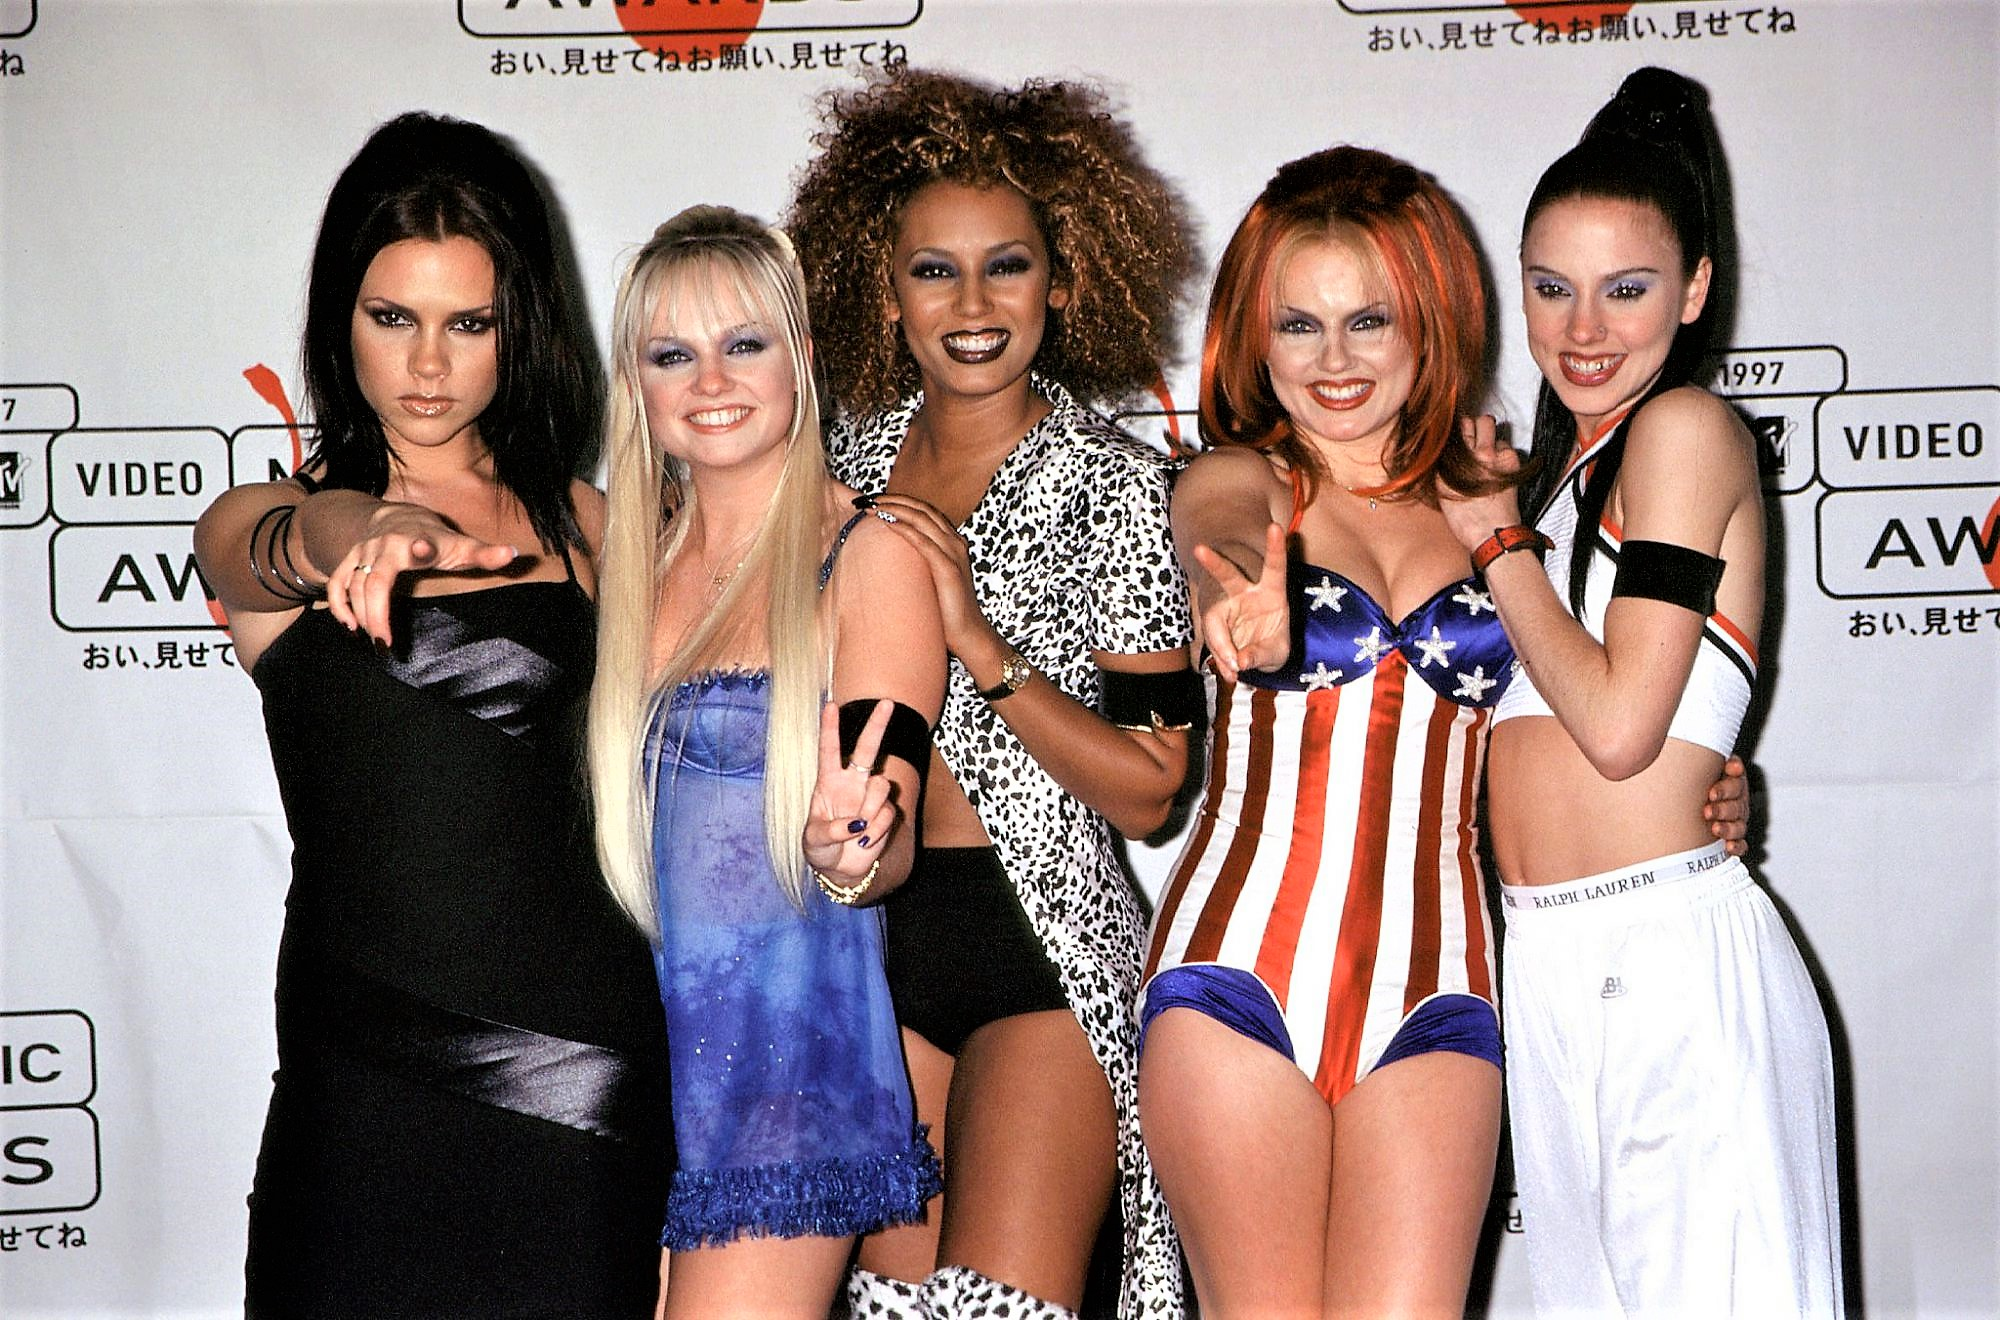 Le Spice Girls in Tour, ma senza Victoria Beckham